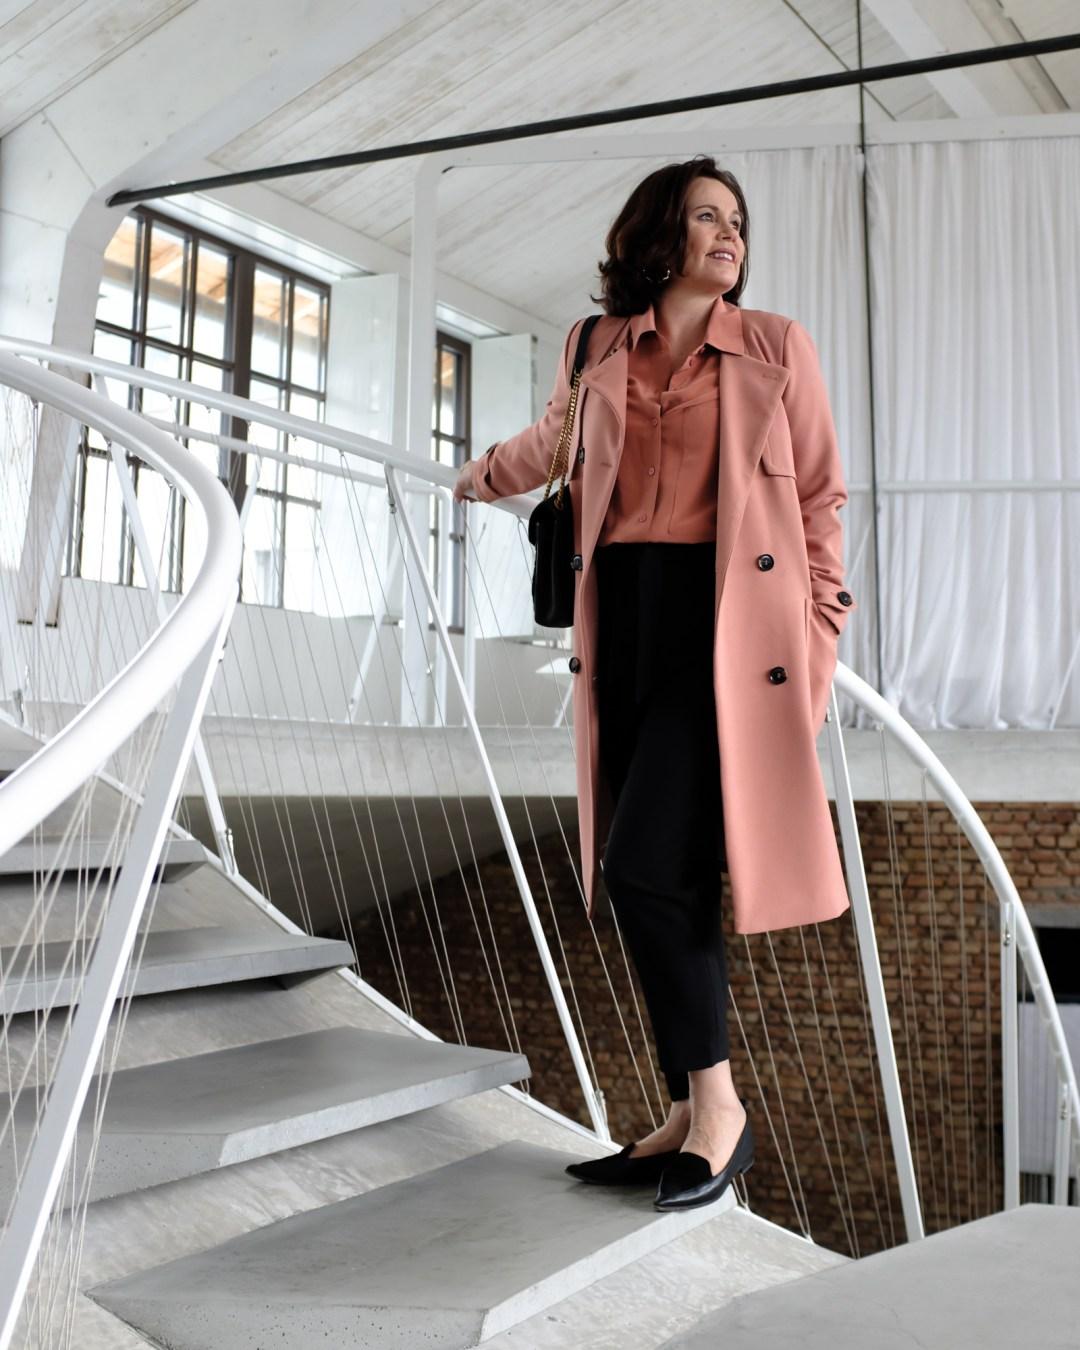 inastil, Trenchcoat, Springcoat, Frühjahrsmode, Stilberatung, Ü50Mode, Modeberatung, Frühlingsfarben, Modeblogger